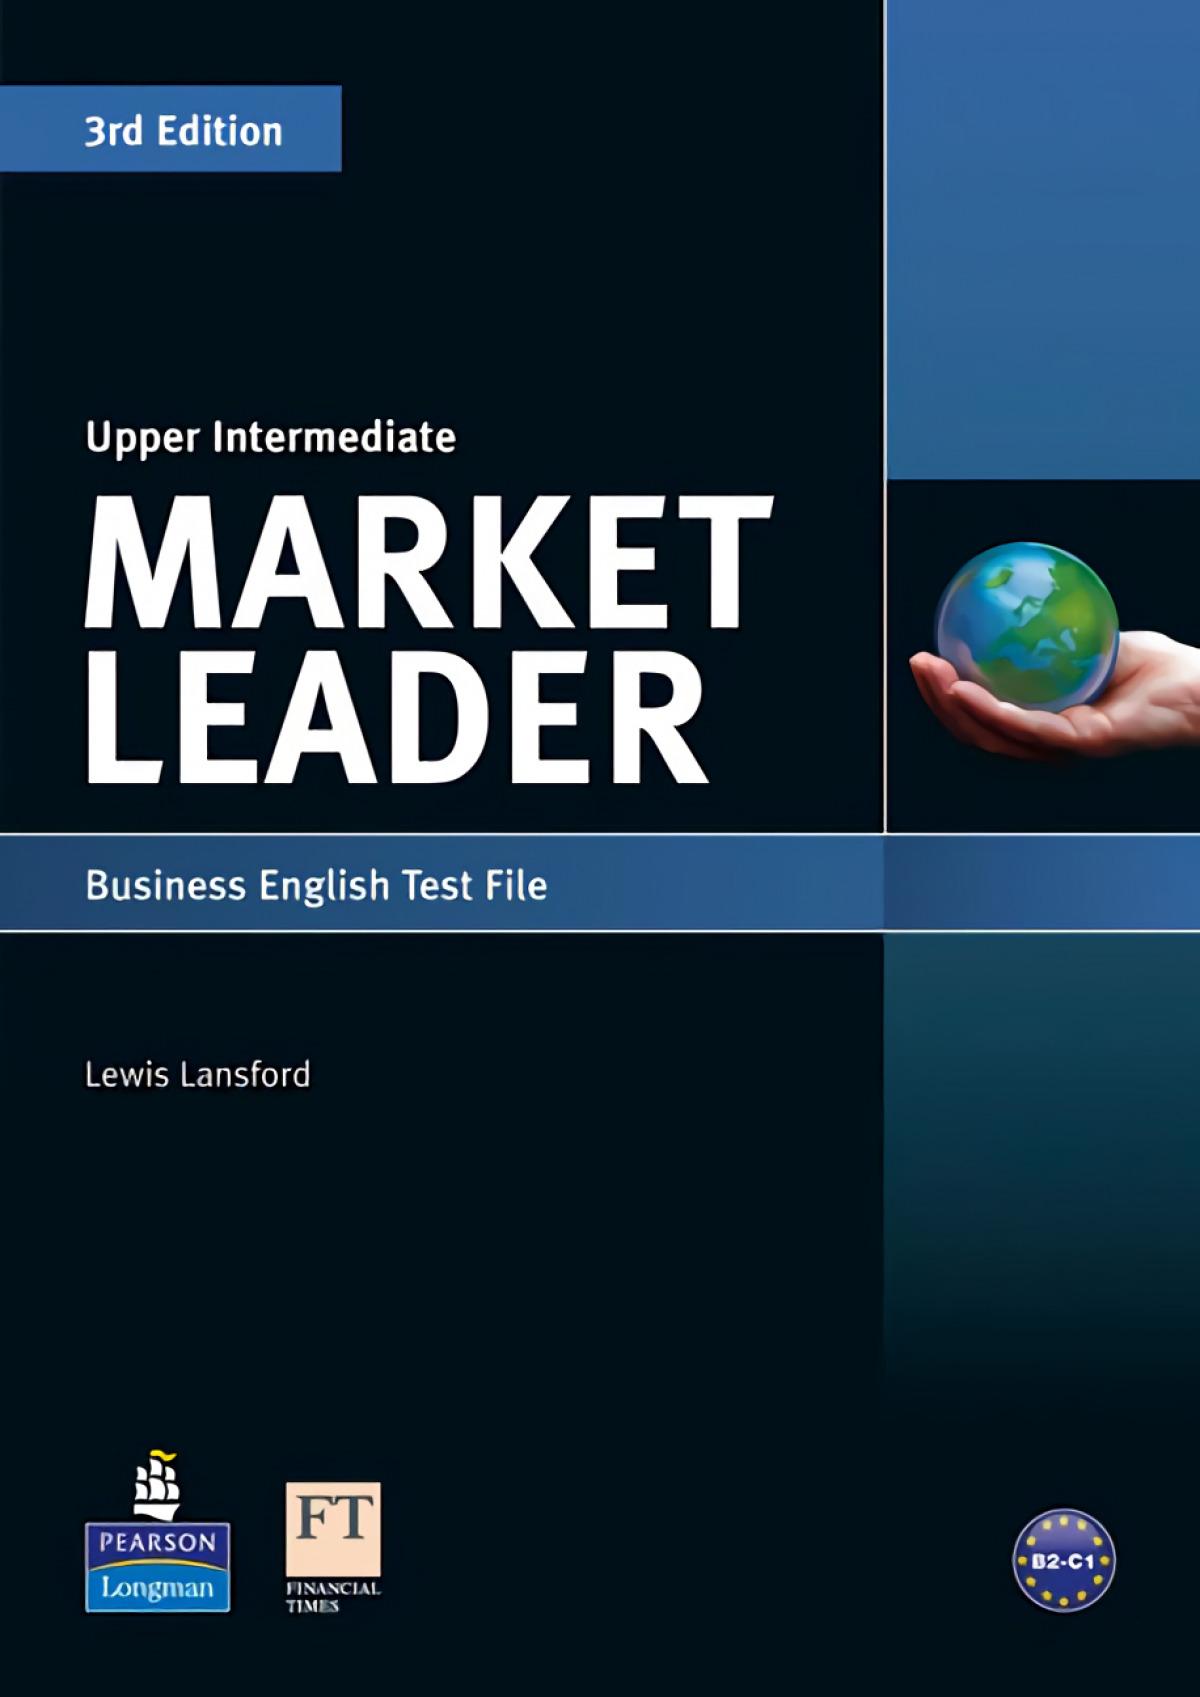 Market Leader 3rd edition Upper Intermediate Test File